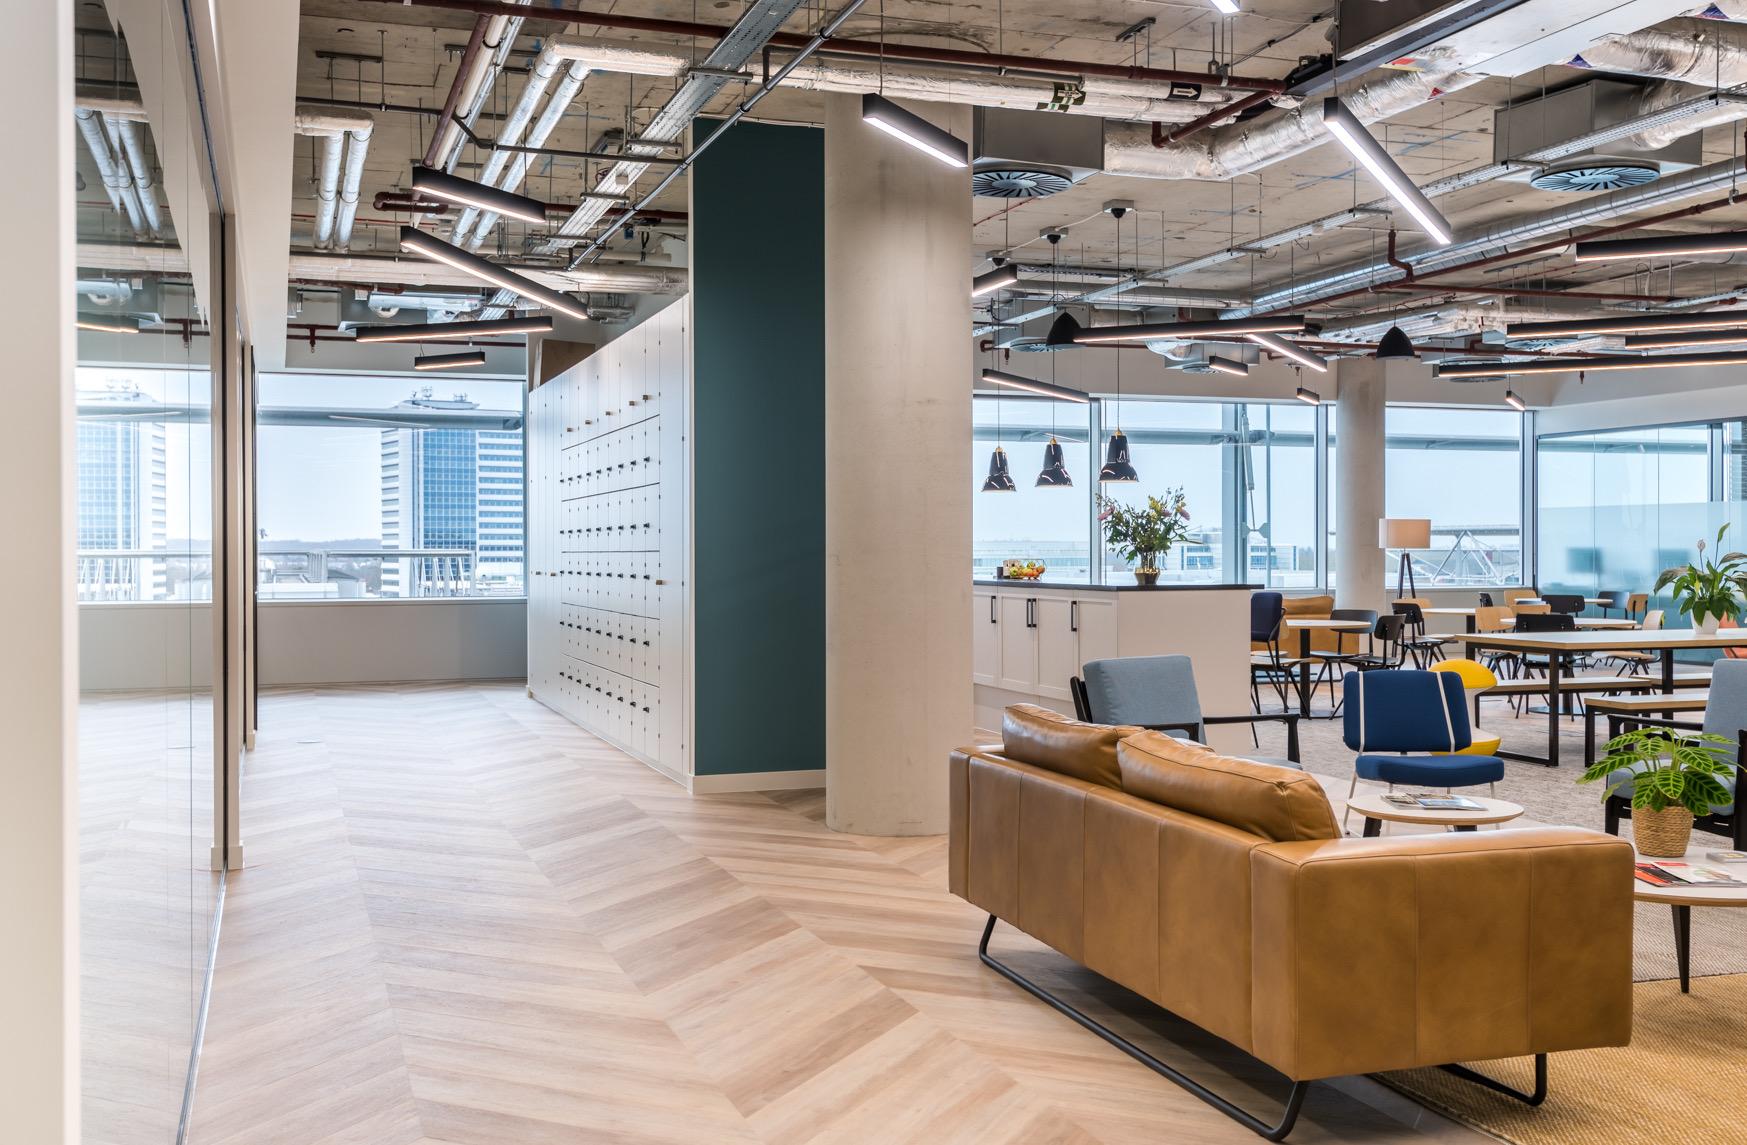 venture-x-london-coworking-space-6